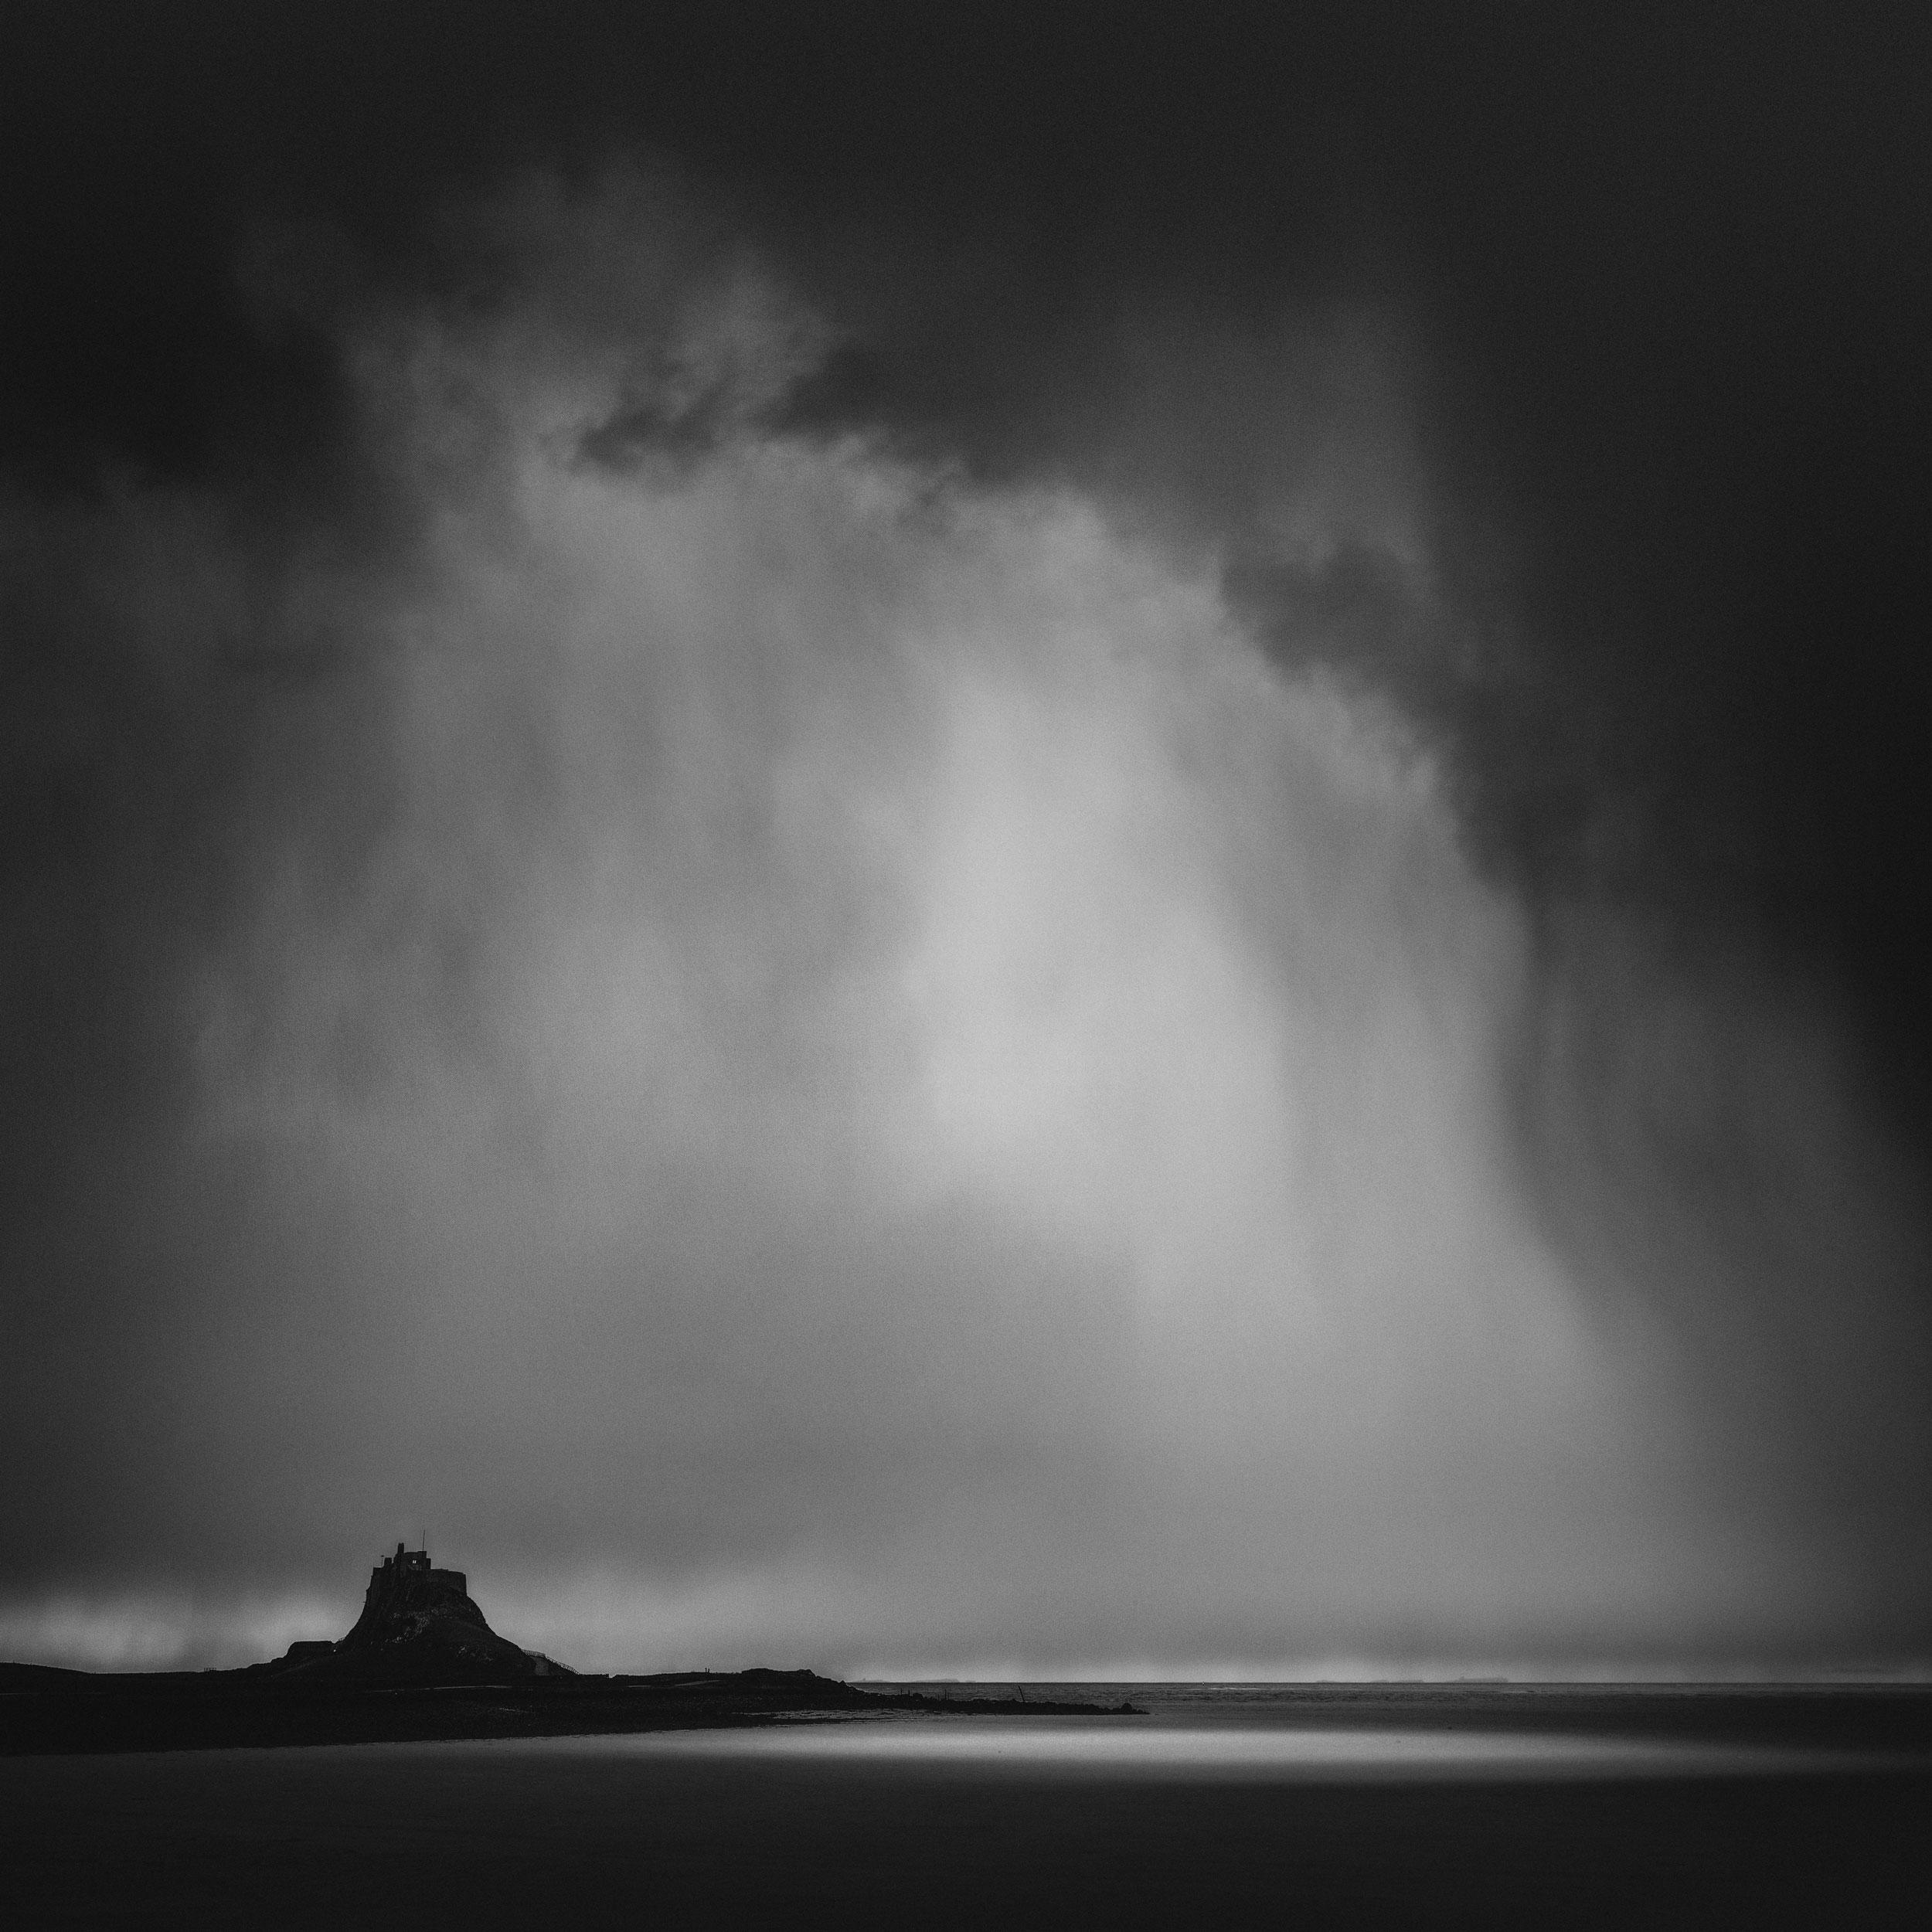 190201-Holy-Island-Lindisfarne-resized-2500.jpg